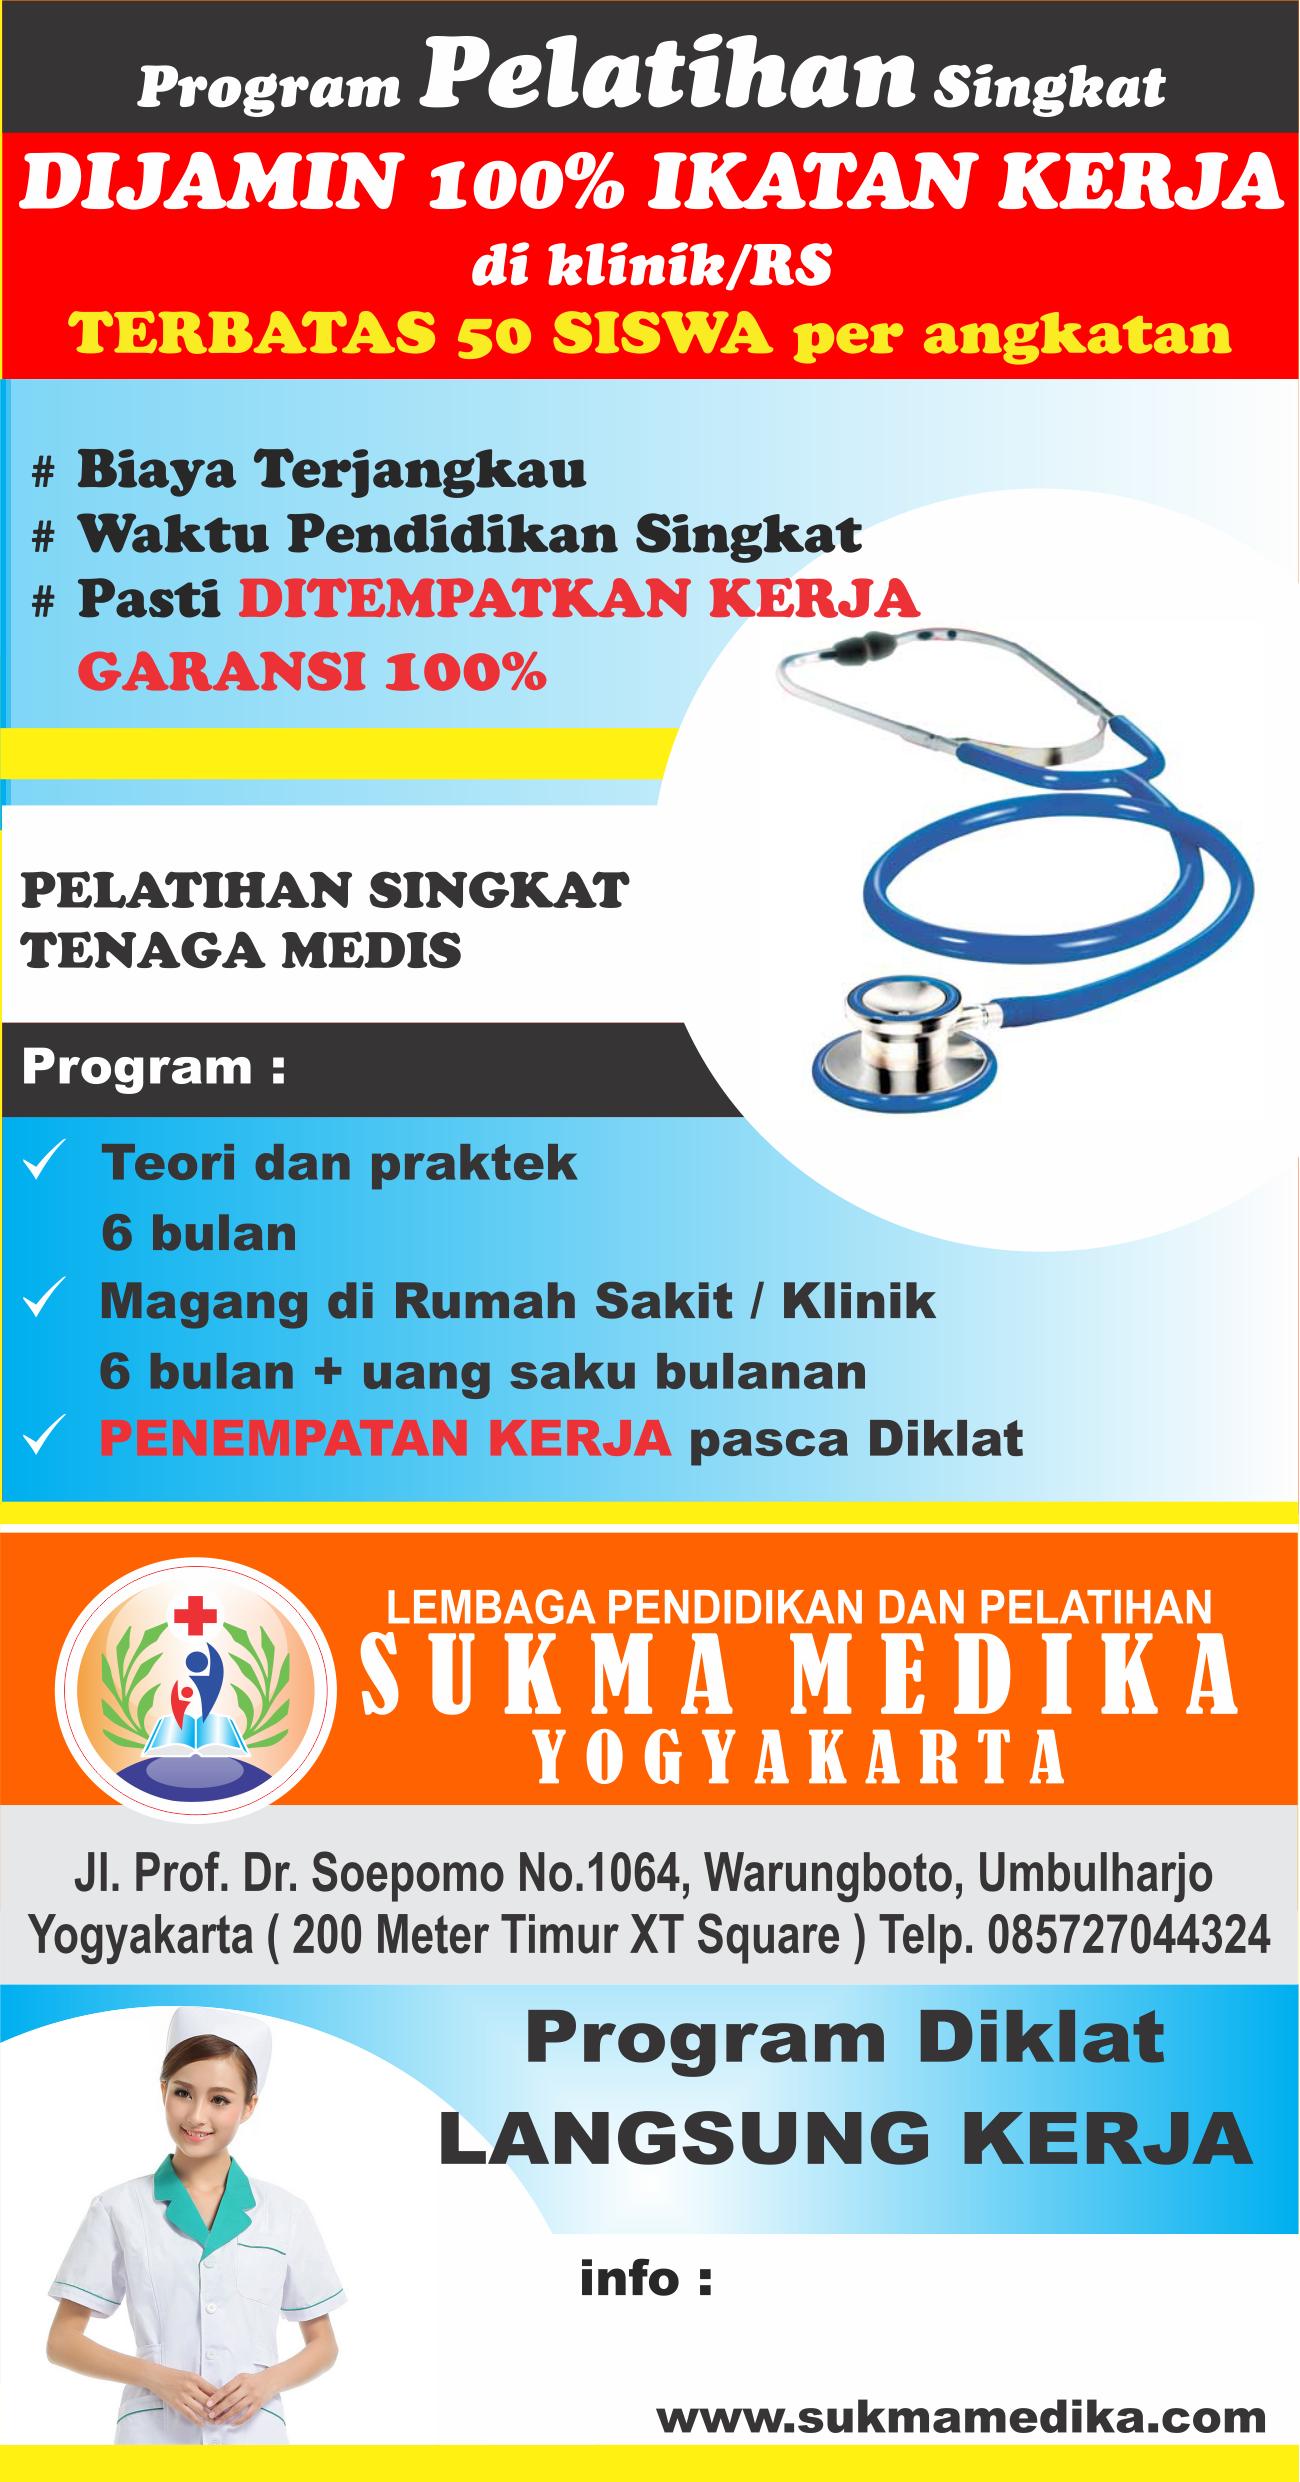 Pelatihan Diklat Tenaga Medis Dijamin Ikatan Kerja Di Klinik Rumah Sakit Dijamin 100 Kerja Garansi 100 Peluang Menjadi Ten Pendidikan Medis Latihan